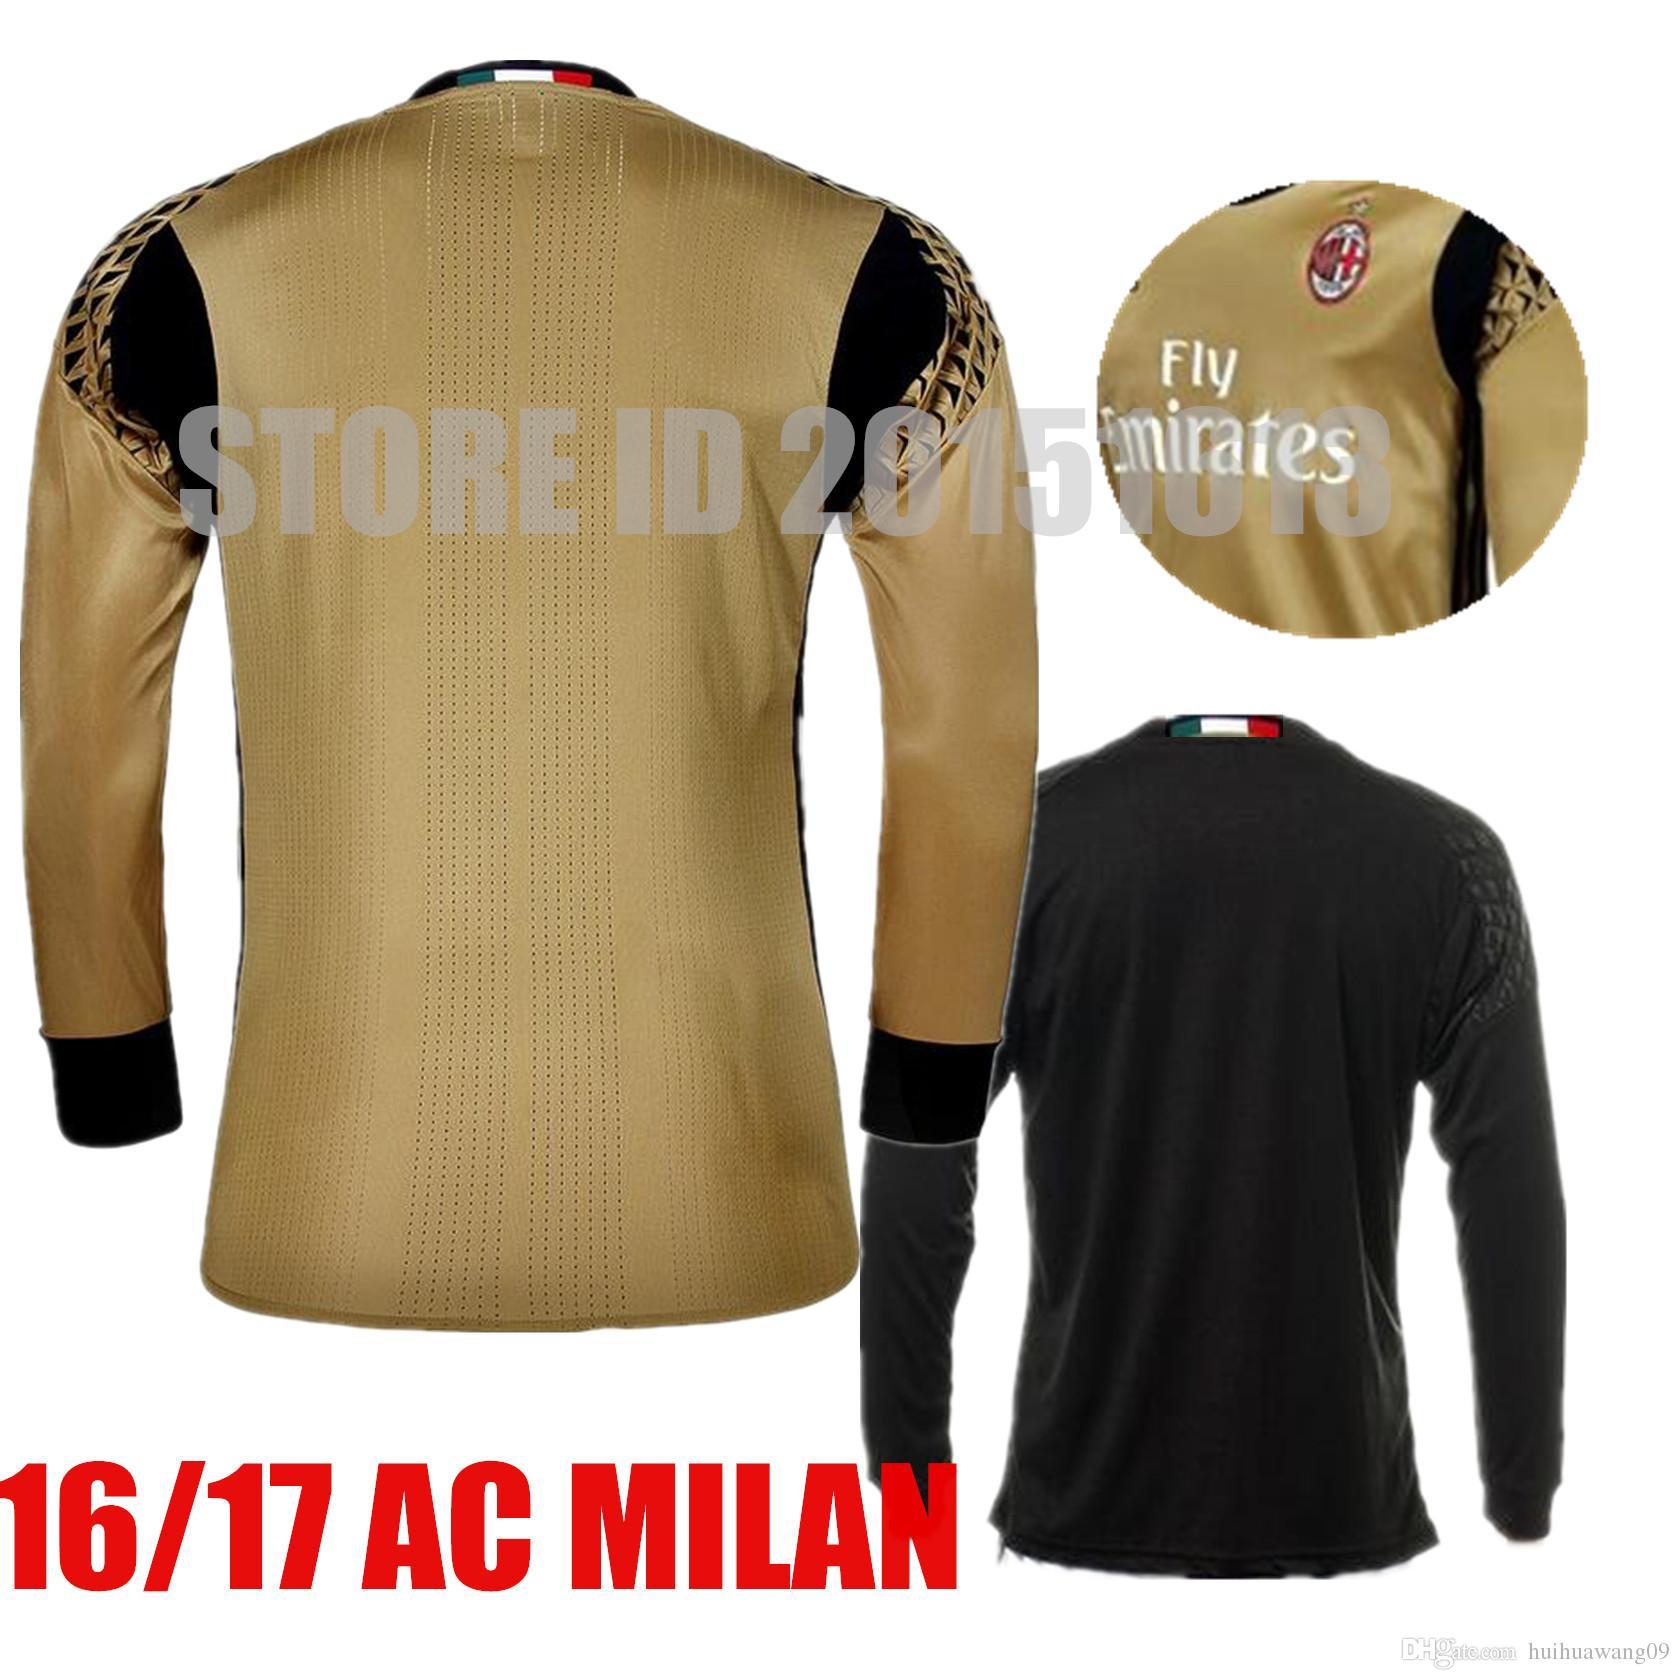 2017 long sleeve ac milan goalkeeper soccer jerseys 99 gianluigi donnarumma gabriel black gold goalie milan norway selnaes home soccer country